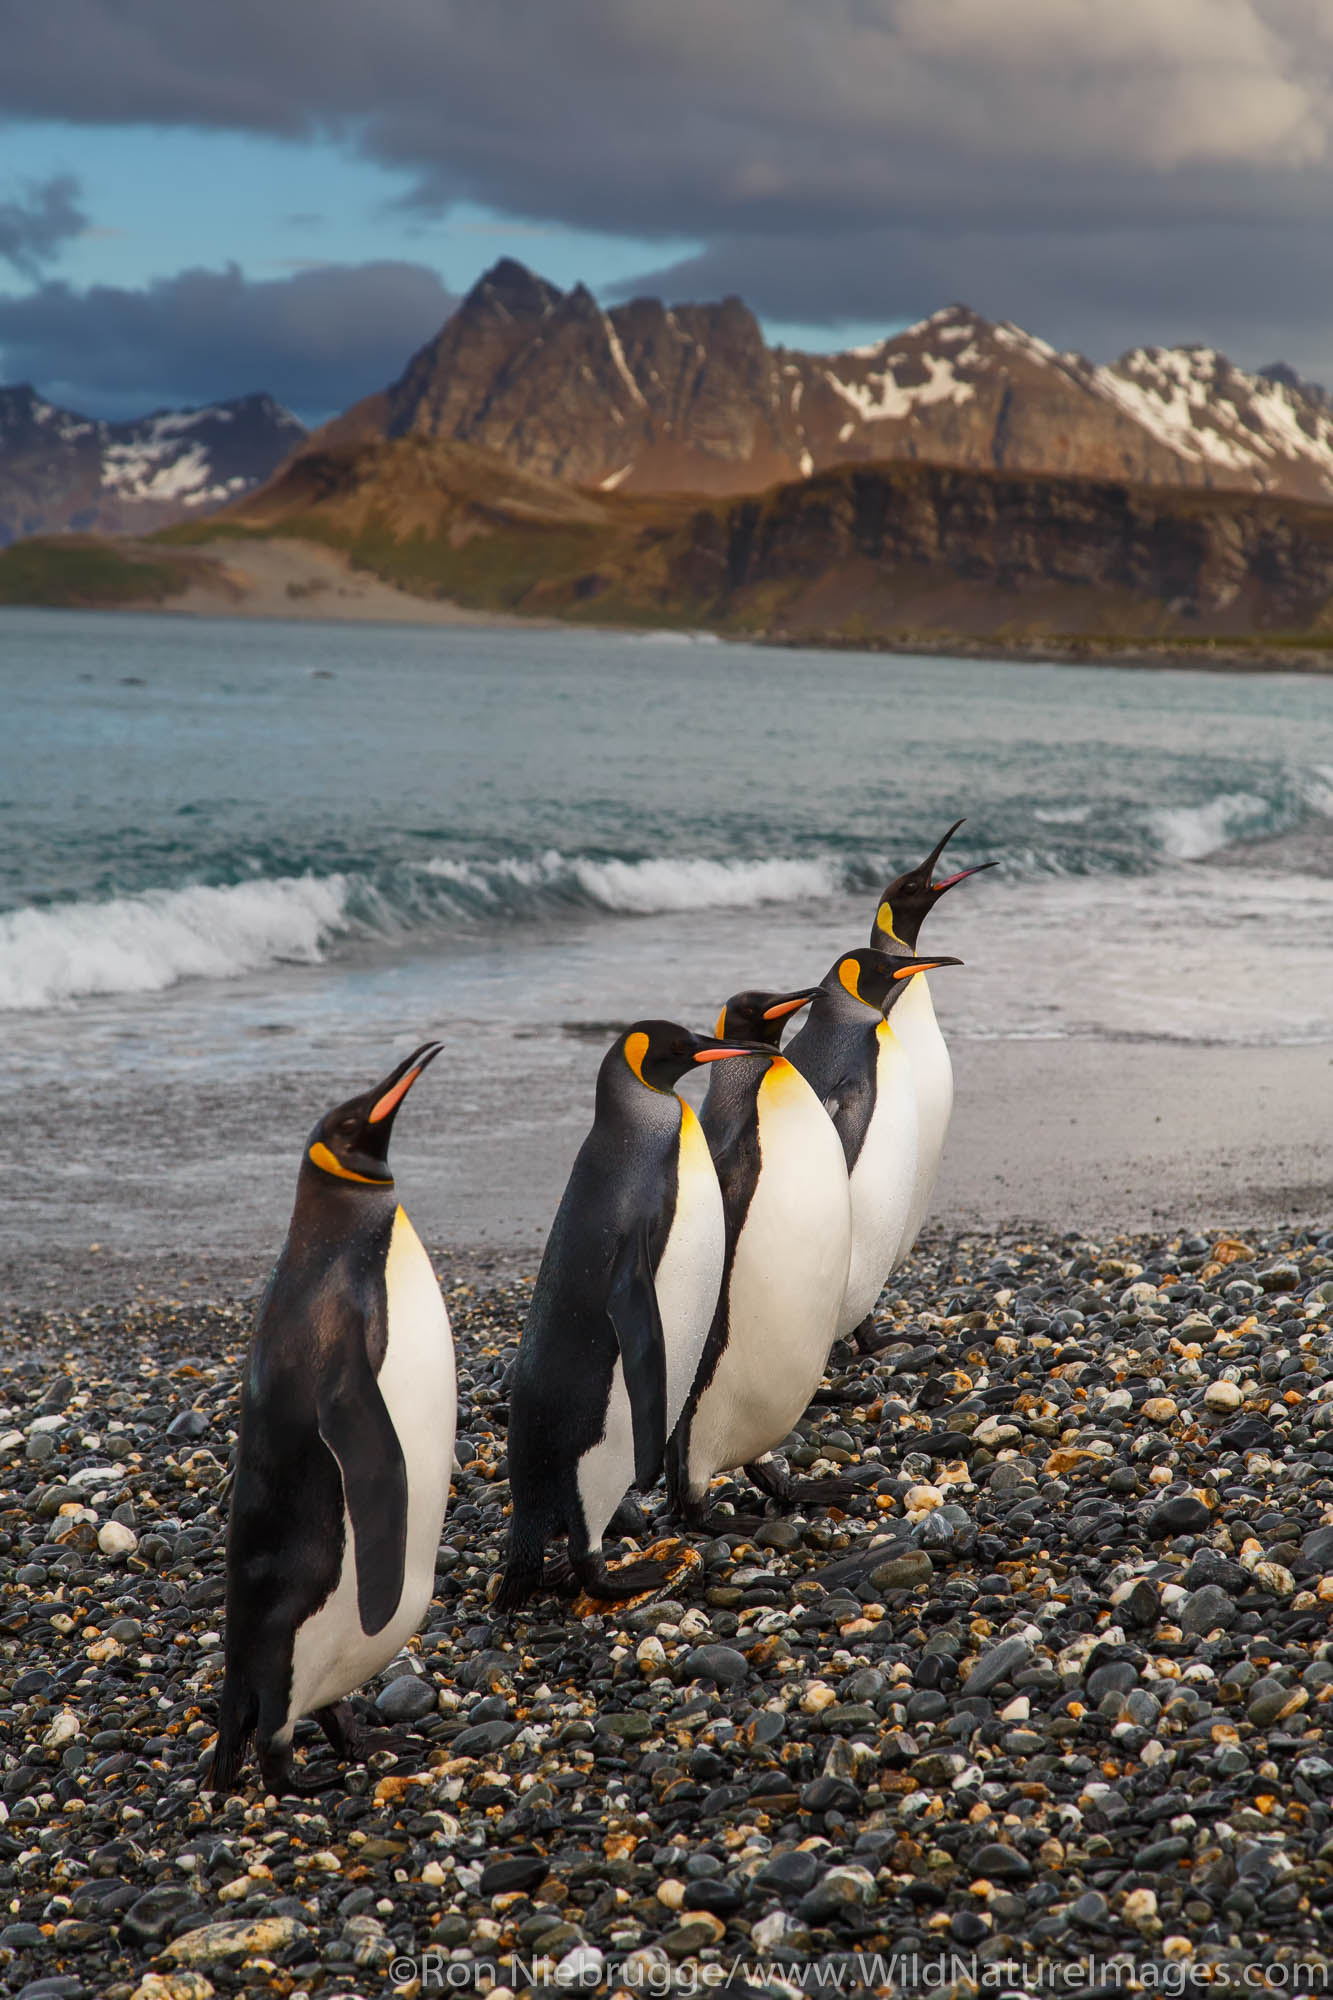 King penguins (Aptenodytes patagonicus) on the Salisbury Plain, South Georgia, Antarctica.